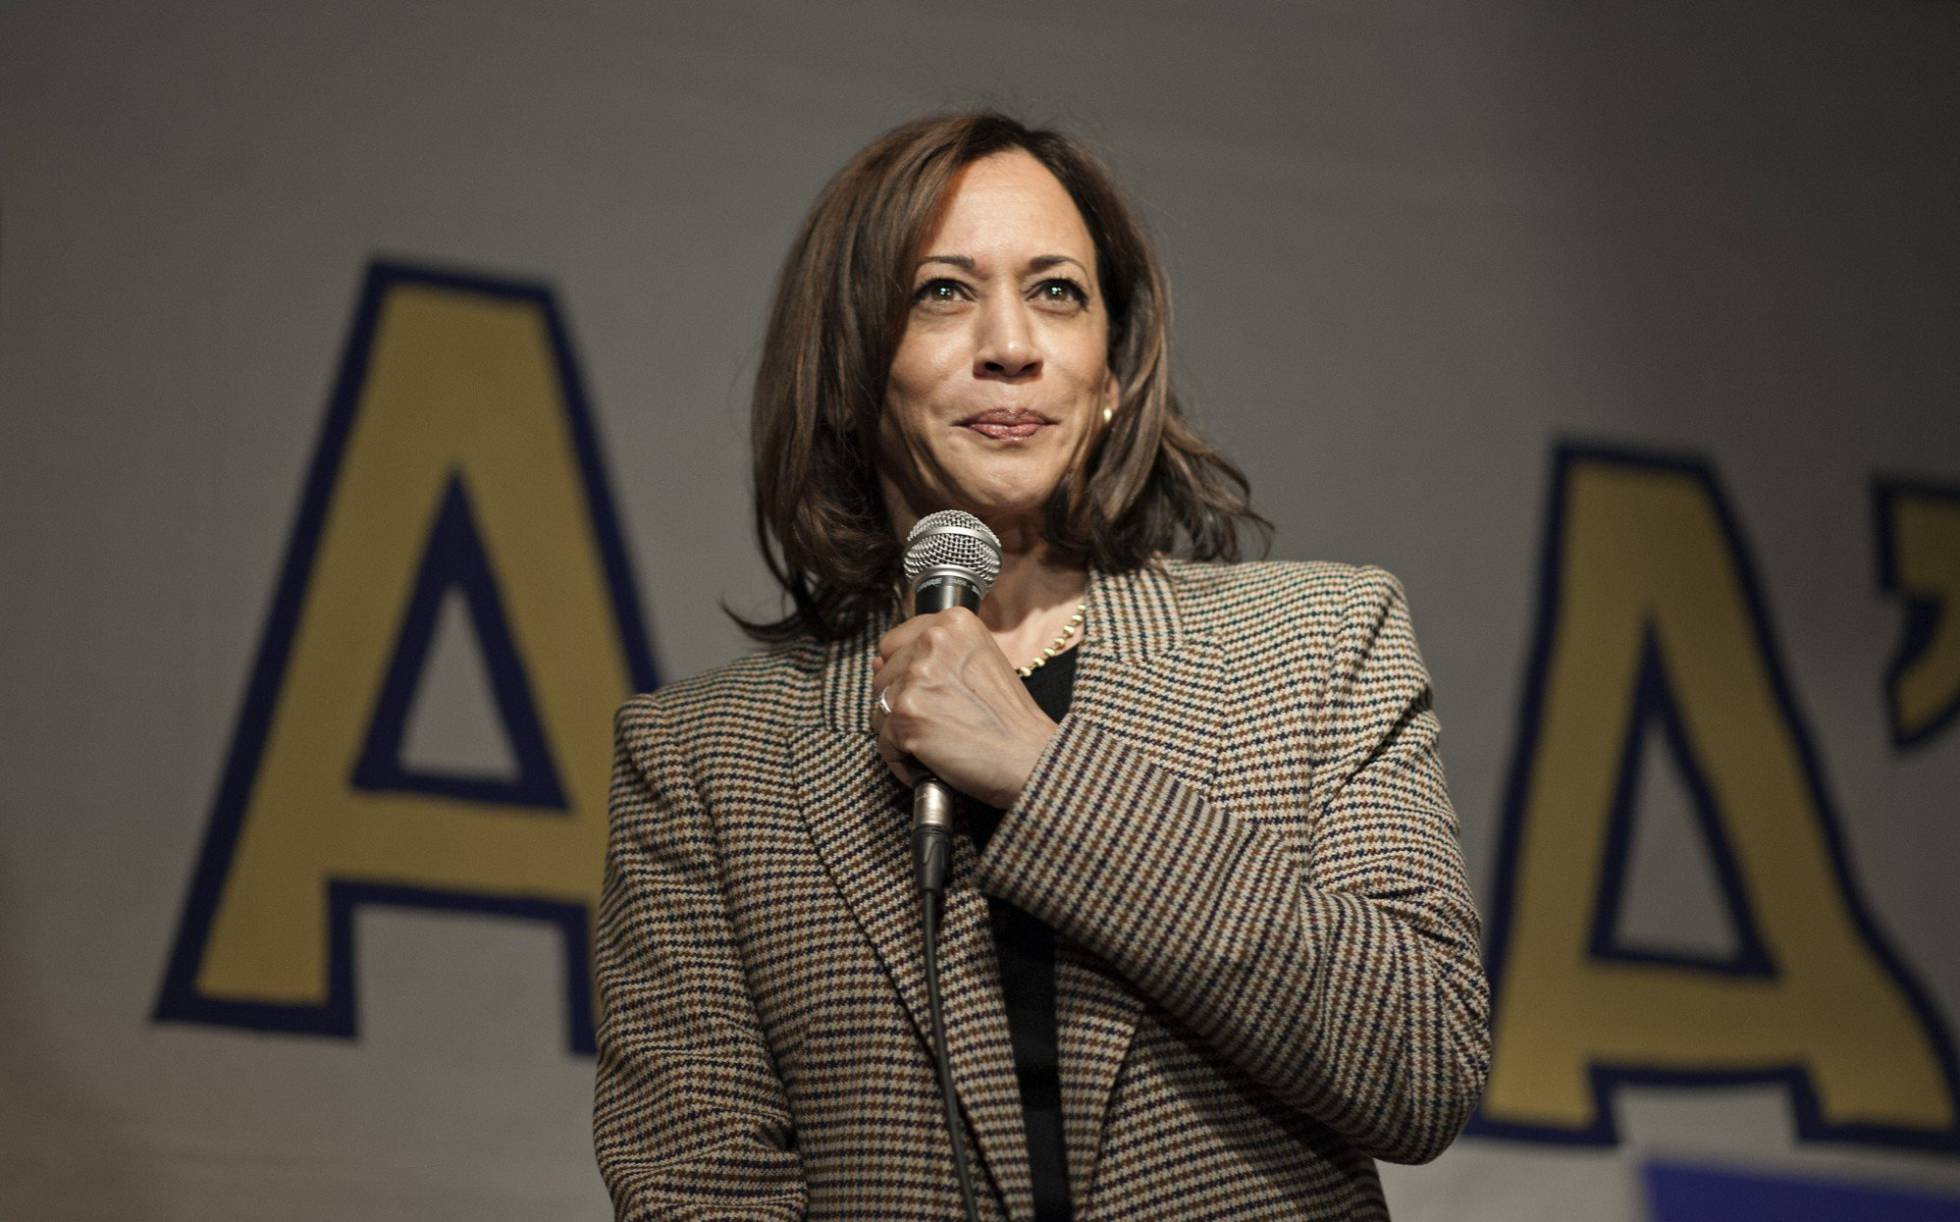 La demócrata Kamala Harris se retira de la carrera presidencial para 2020